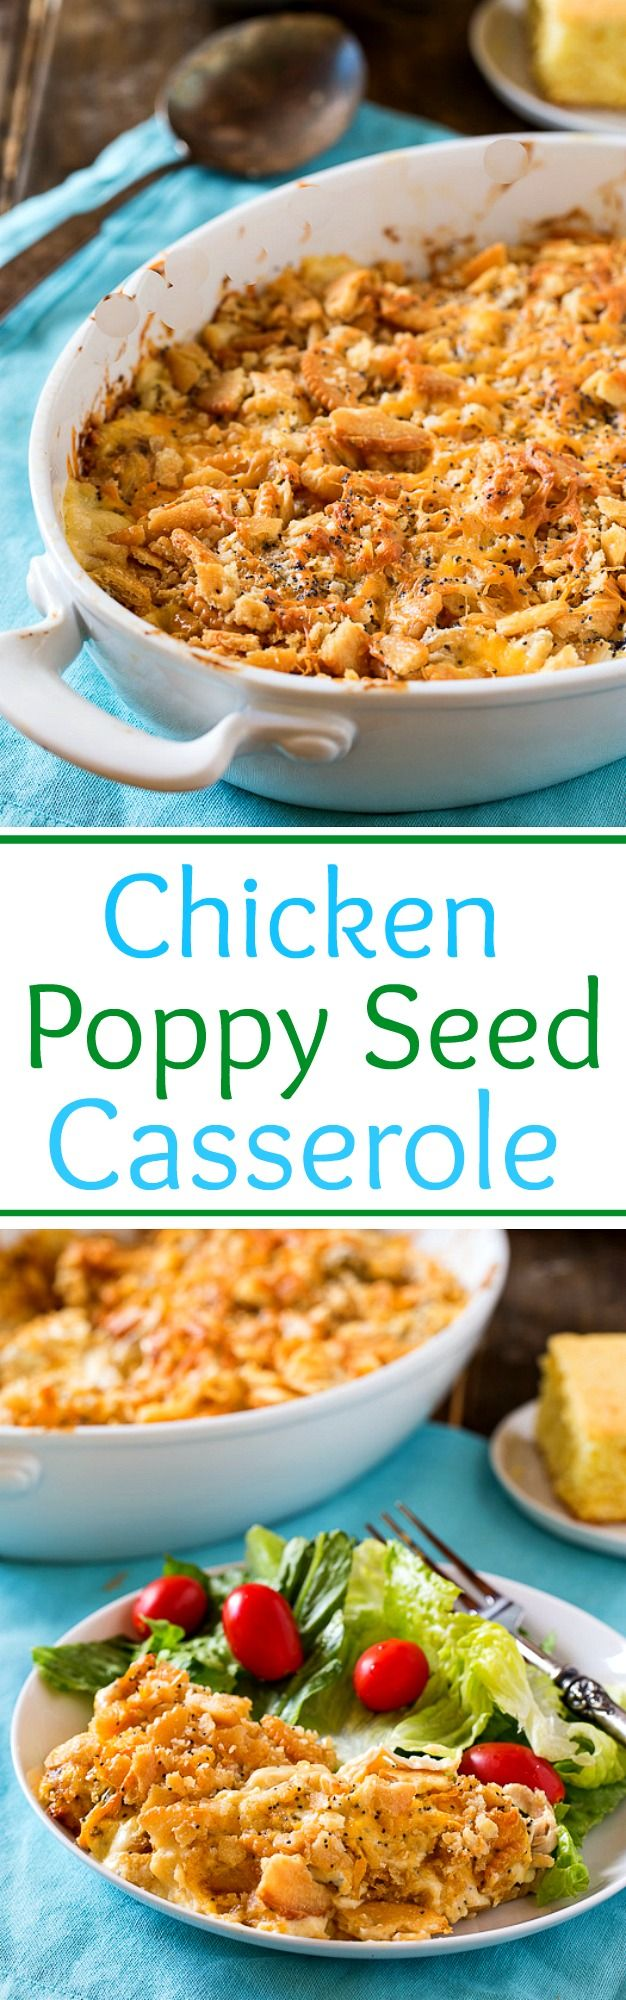 Chicken Poppy Seed Casserole